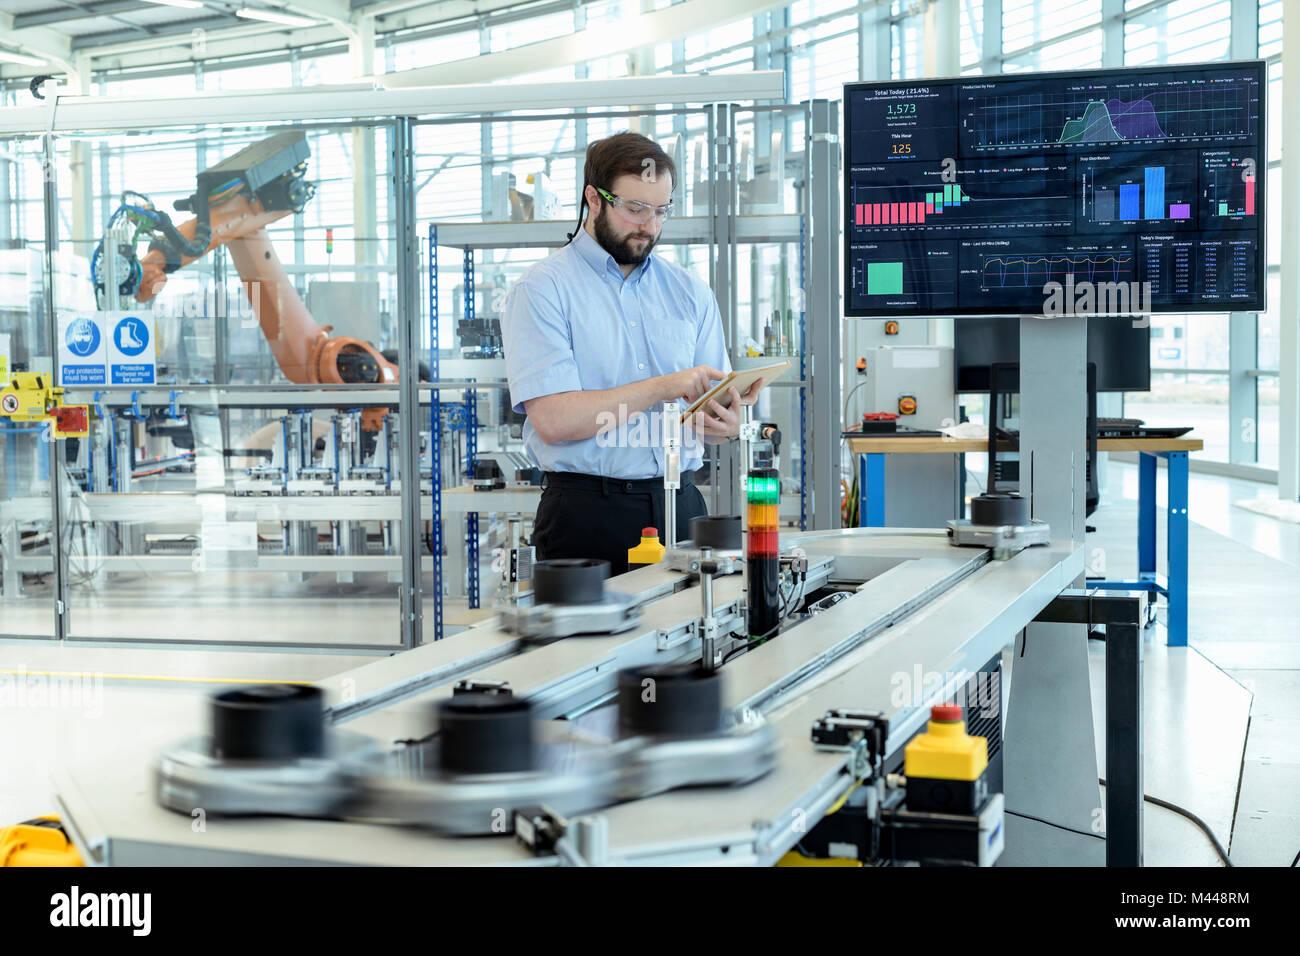 Ingenieur Produktion testen einen Roboter Simulator in Robotics Research Facility Stockbild